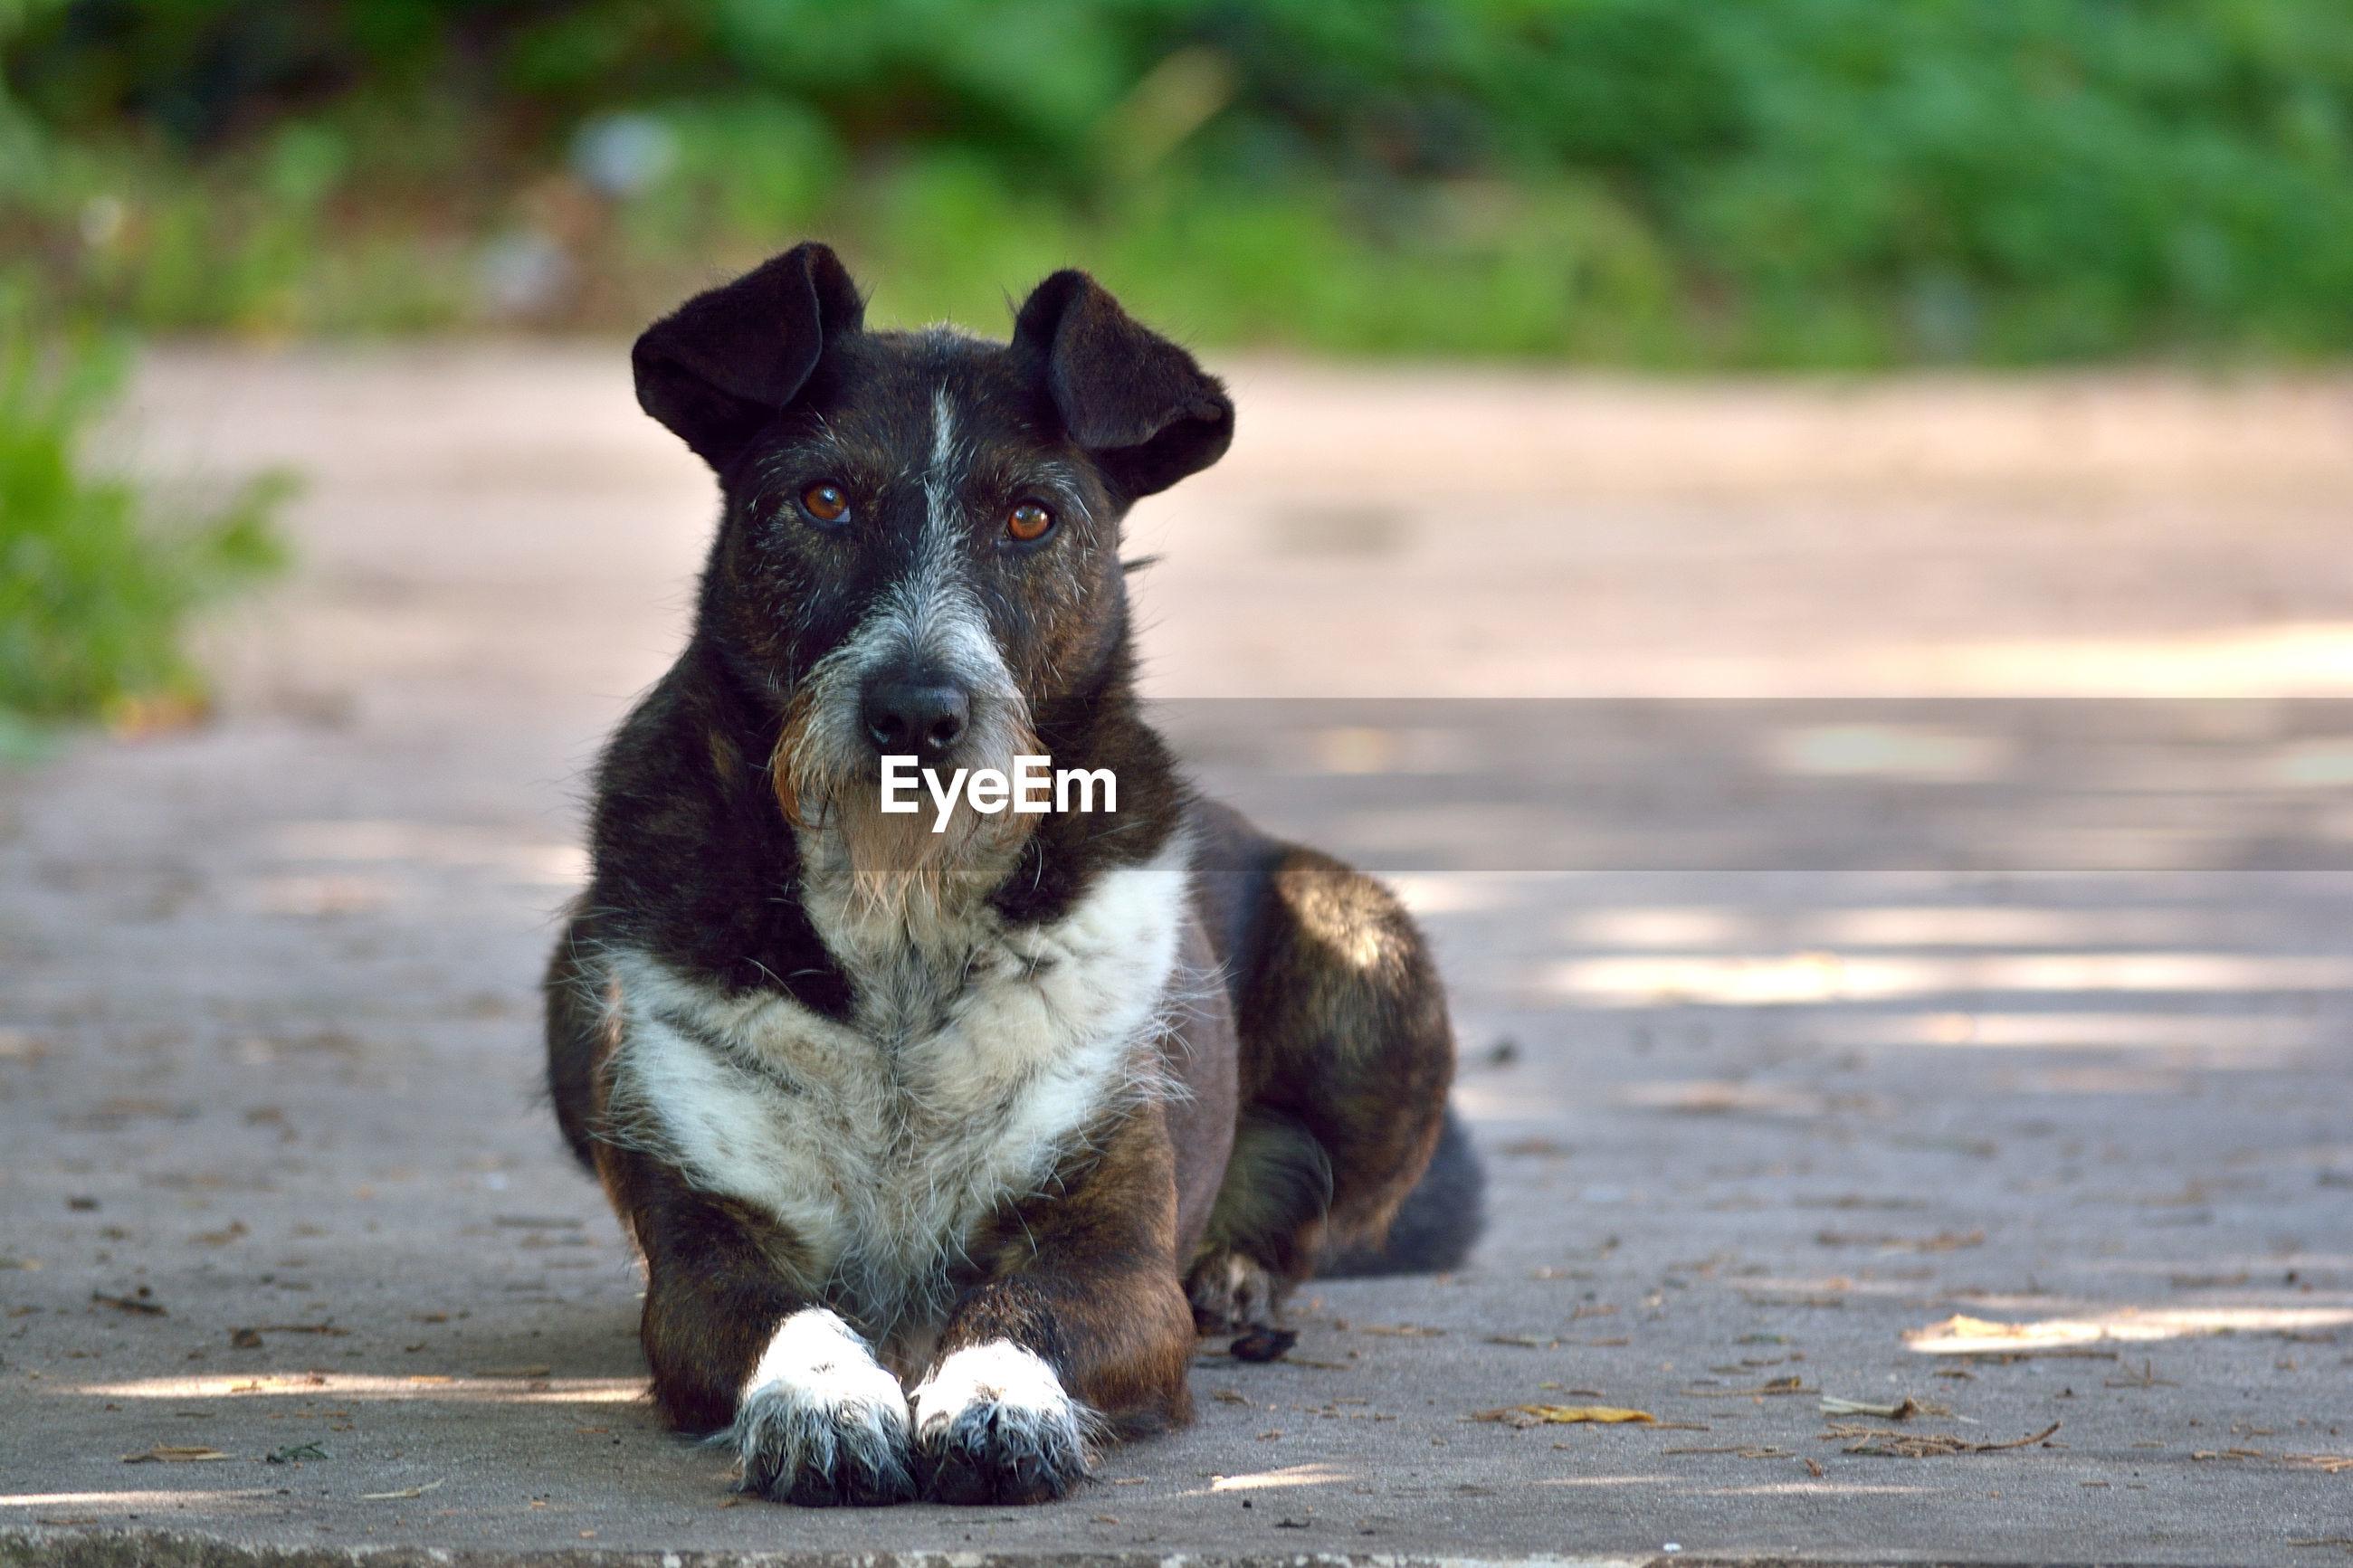 Portrait of dog sitting on street